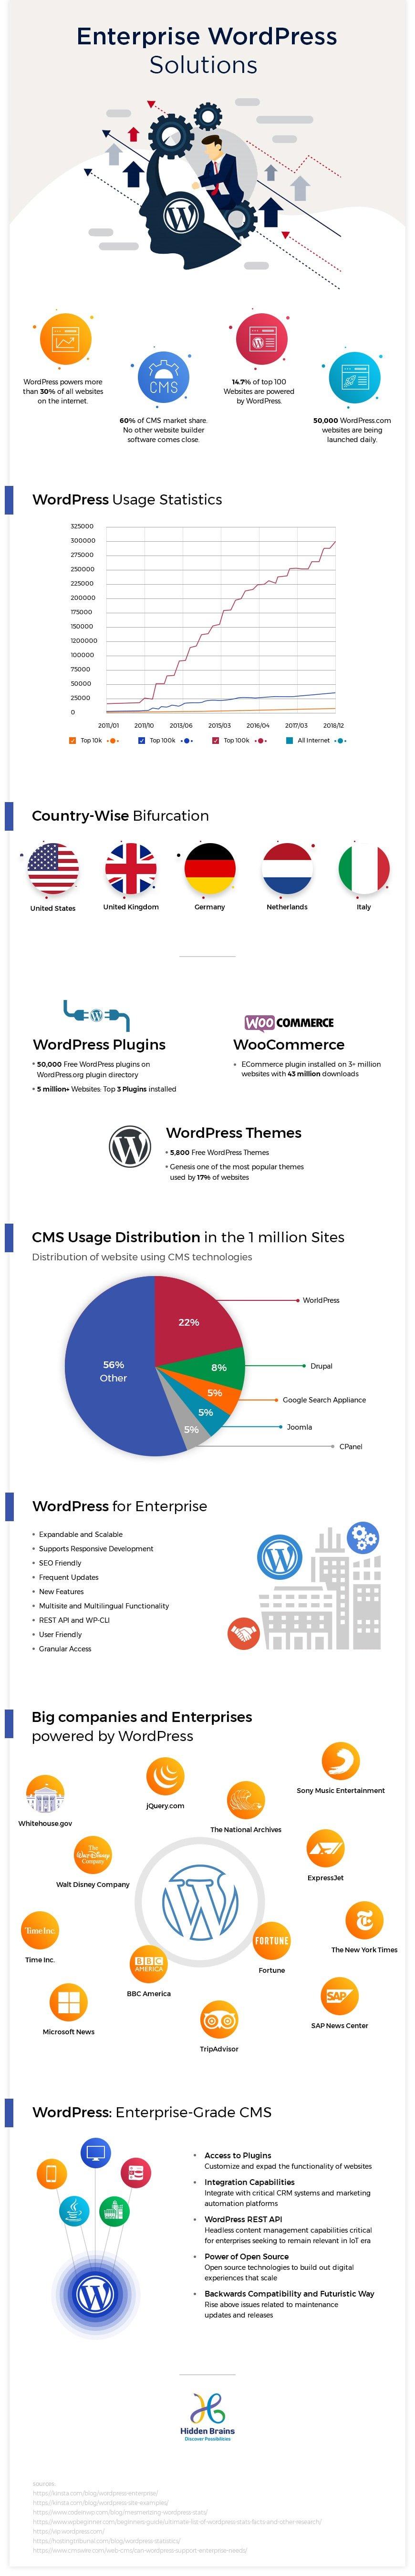 Infographic: WordPress & the Rise in Enterprise World